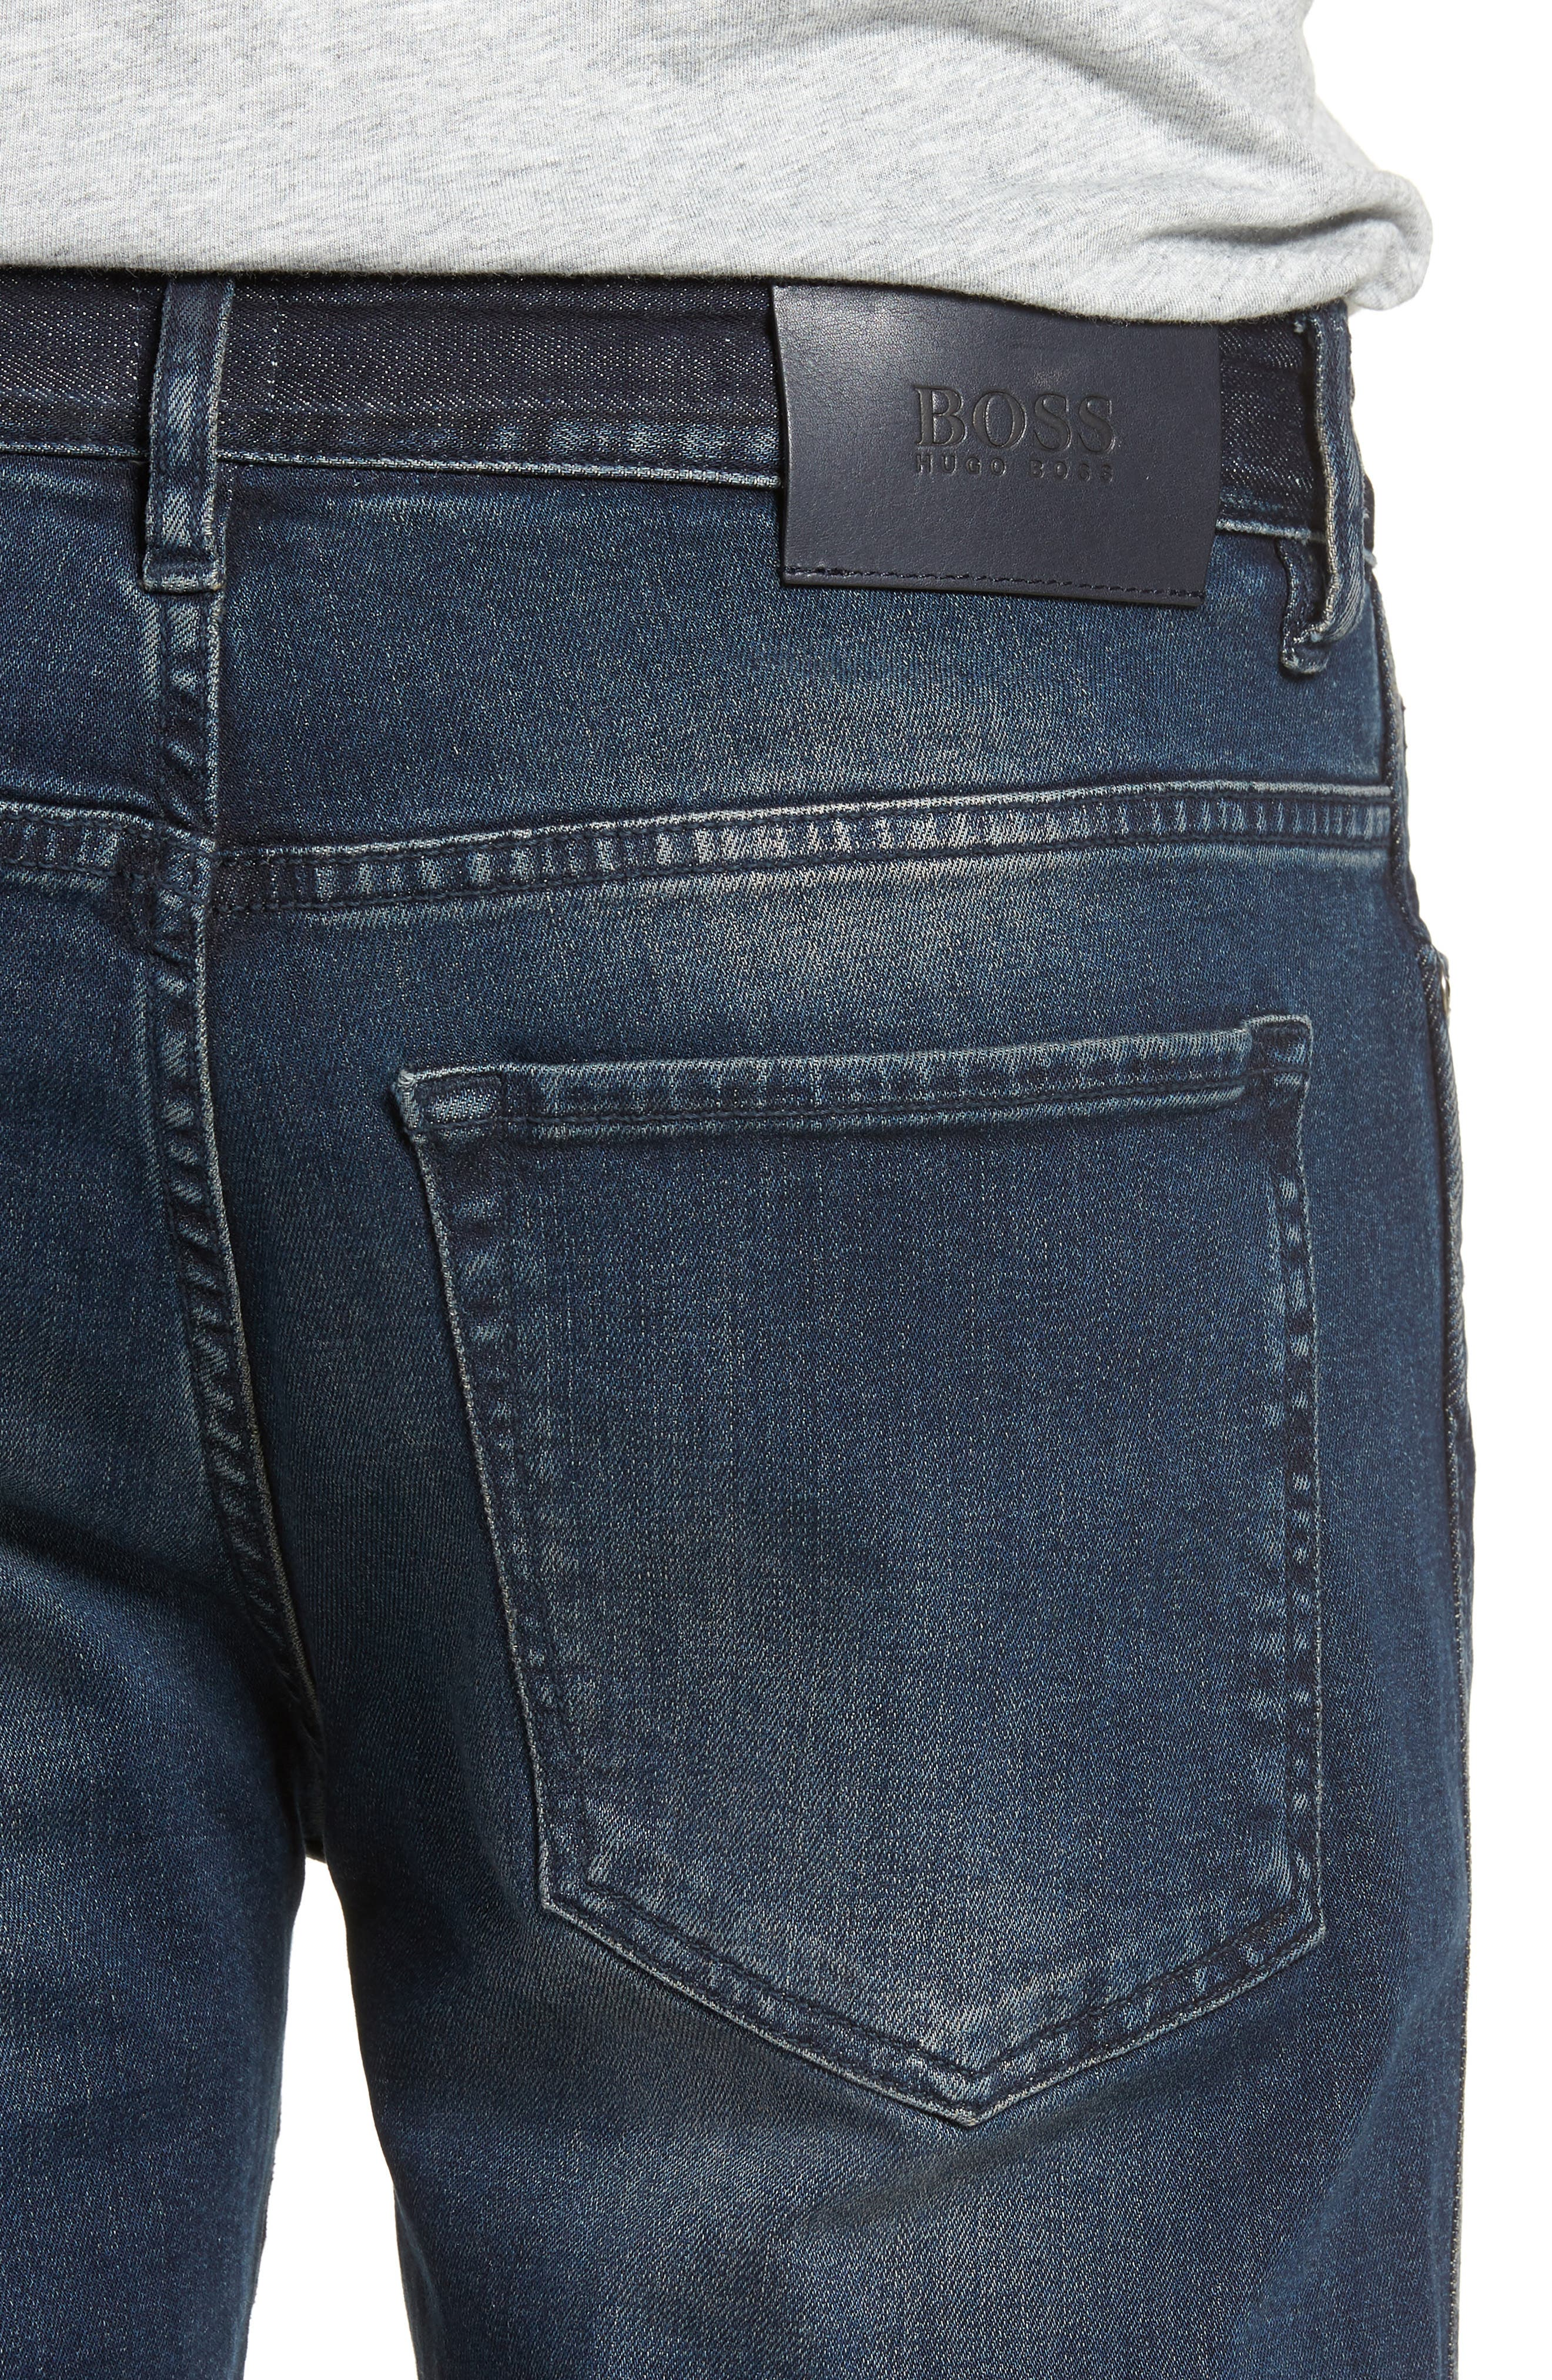 Delaware Slim Fit Jeans,                             Alternate thumbnail 4, color,                             Blue